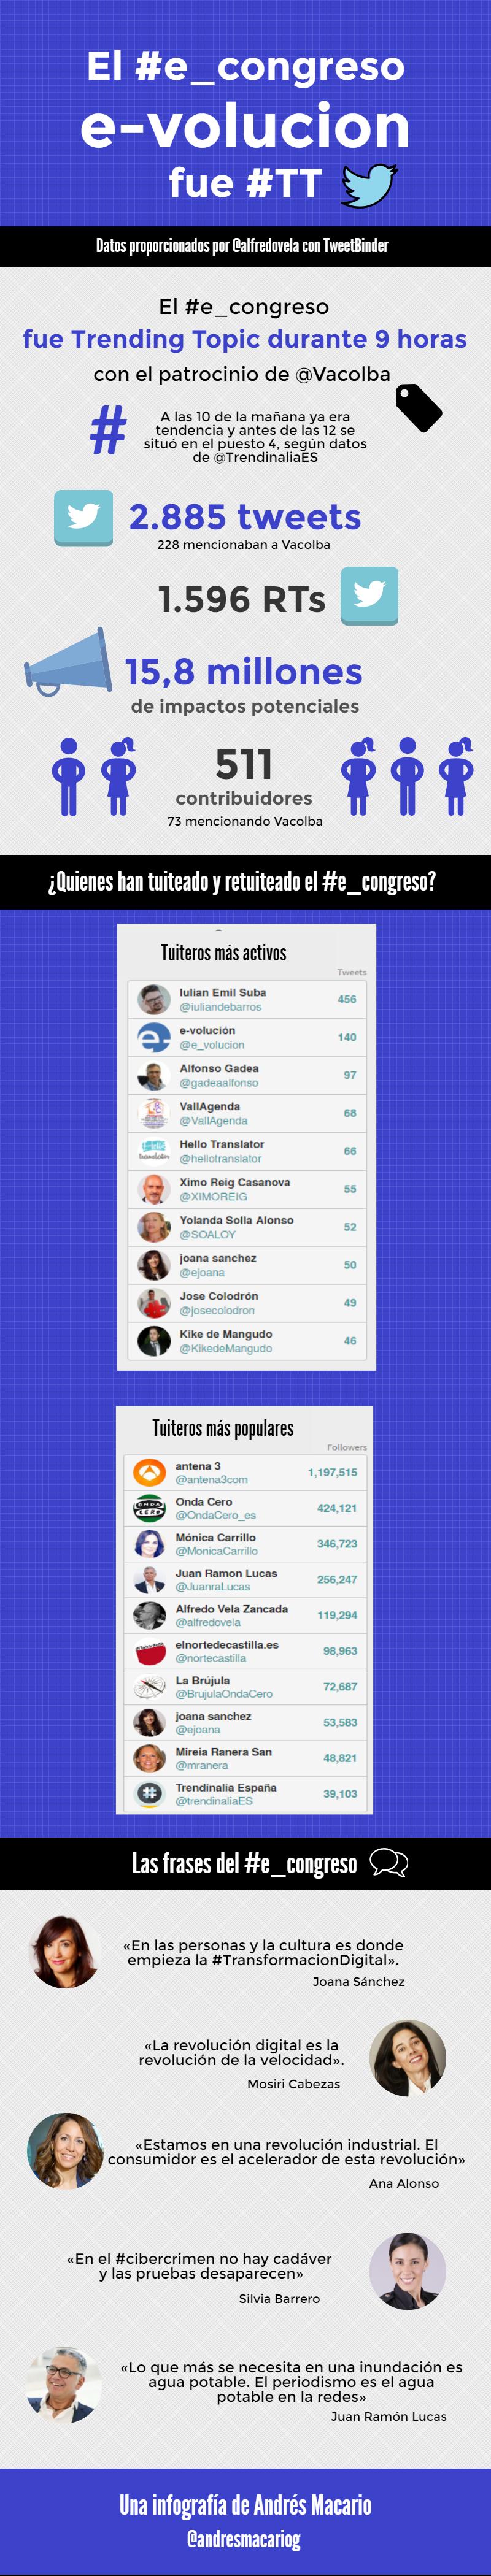 El #econgreso e volucion fue trending topic - Infografia Andres Macario